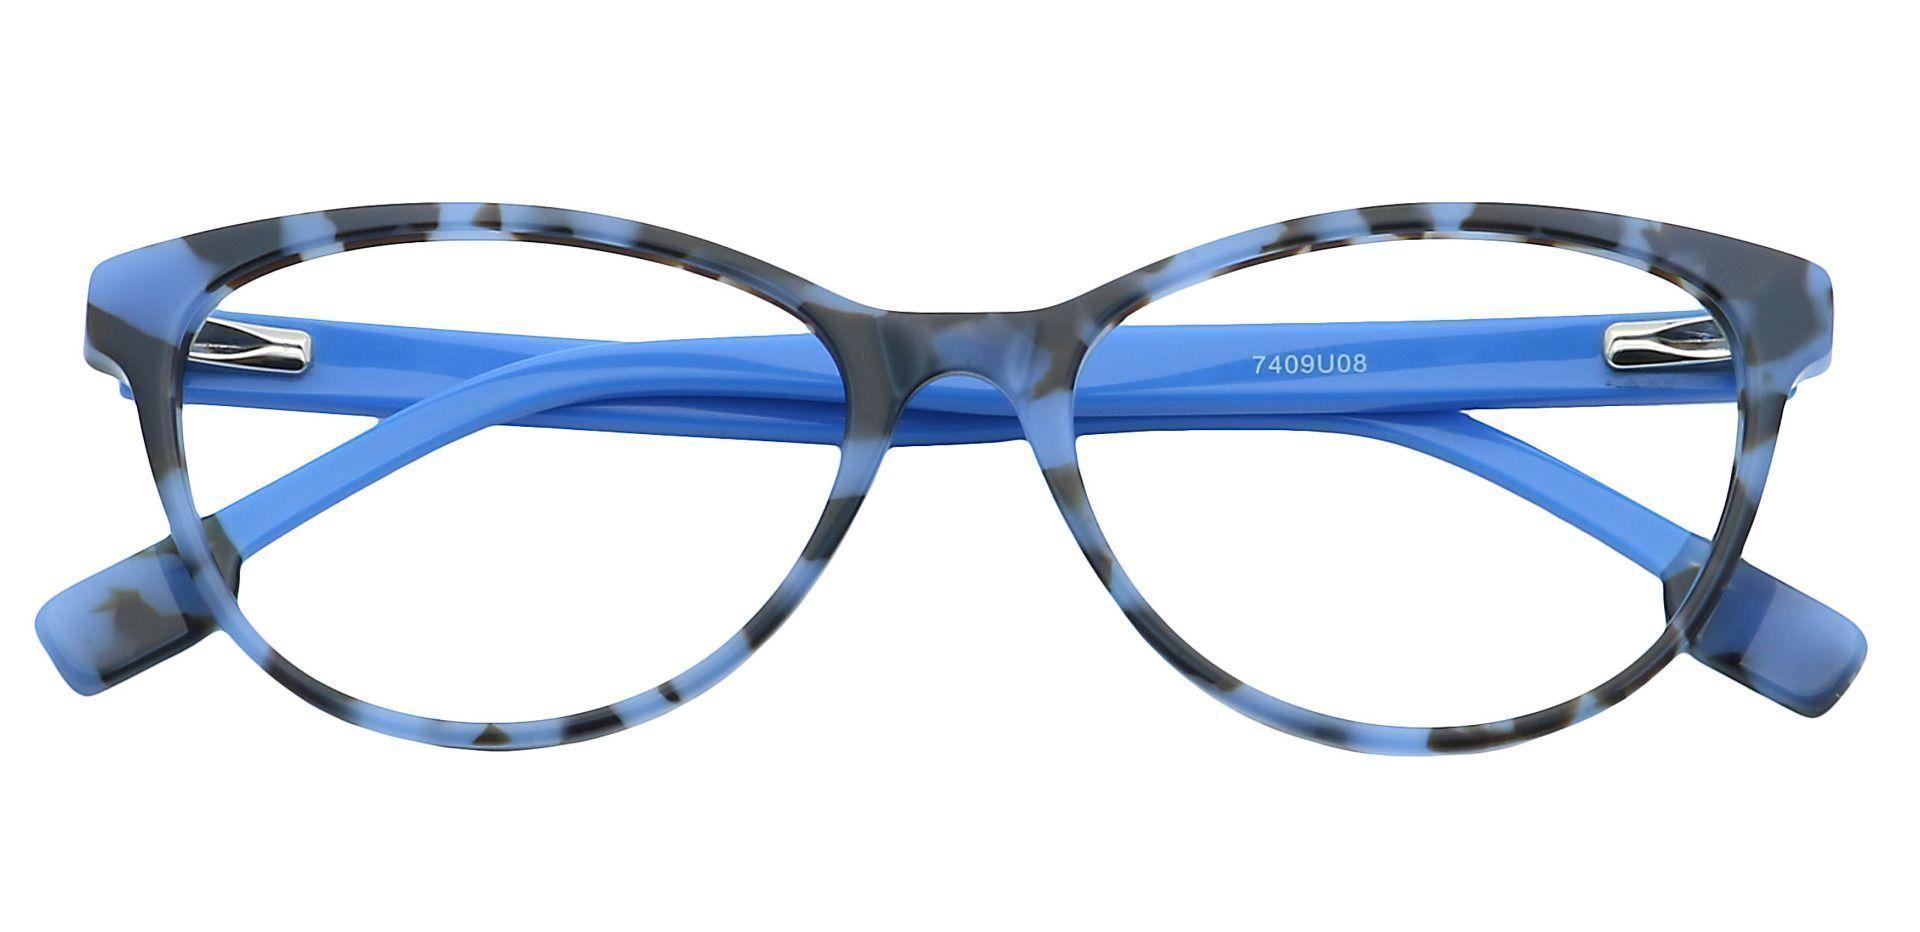 Coral Cat-Eye Prescription Glasses - Blue